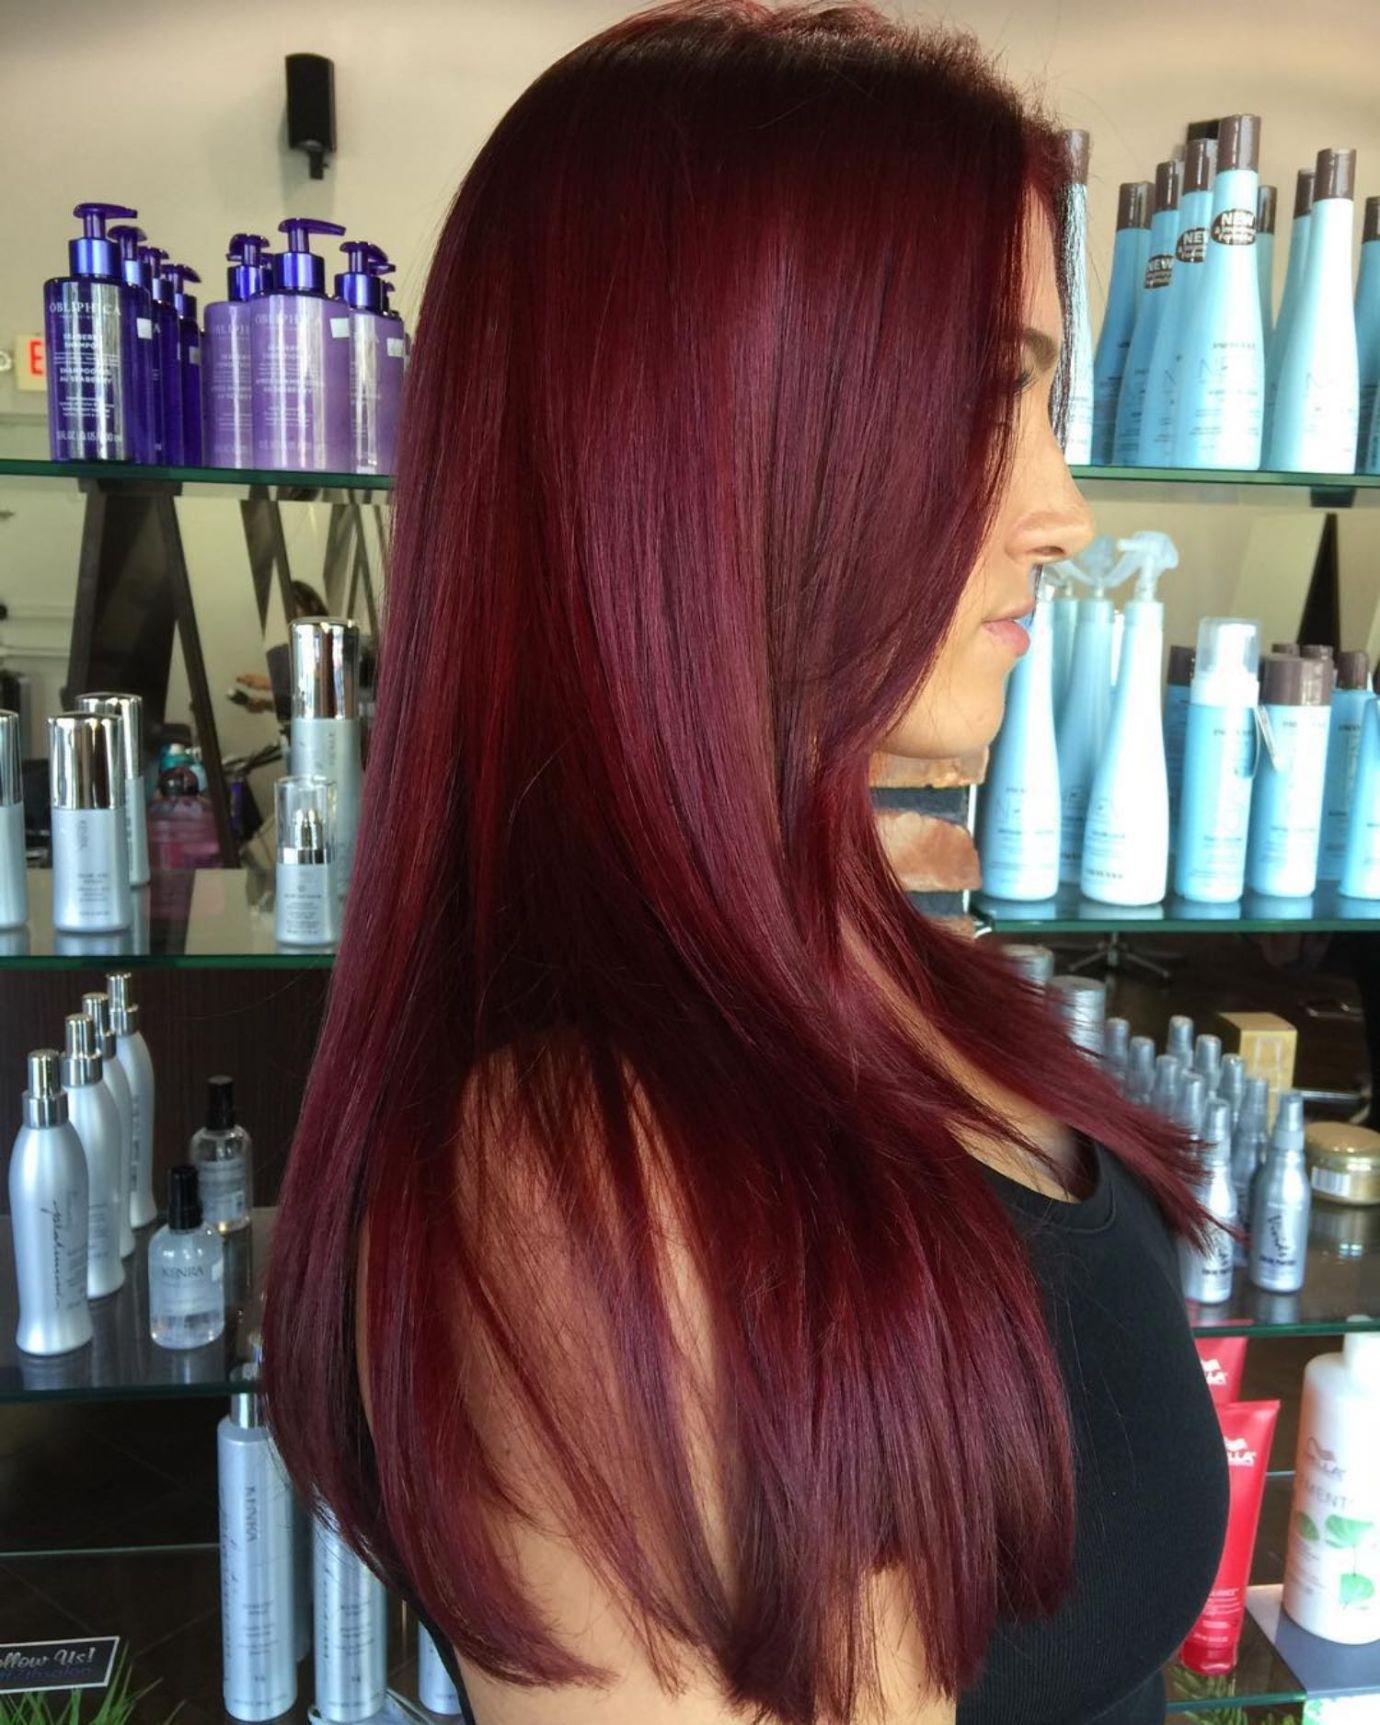 45 Shades of Burgundy Hair: Dark Burgundy, Maroon, Burgundy with Red, Purple and Brown Highlights -   16 plum hair Burgundy ideas